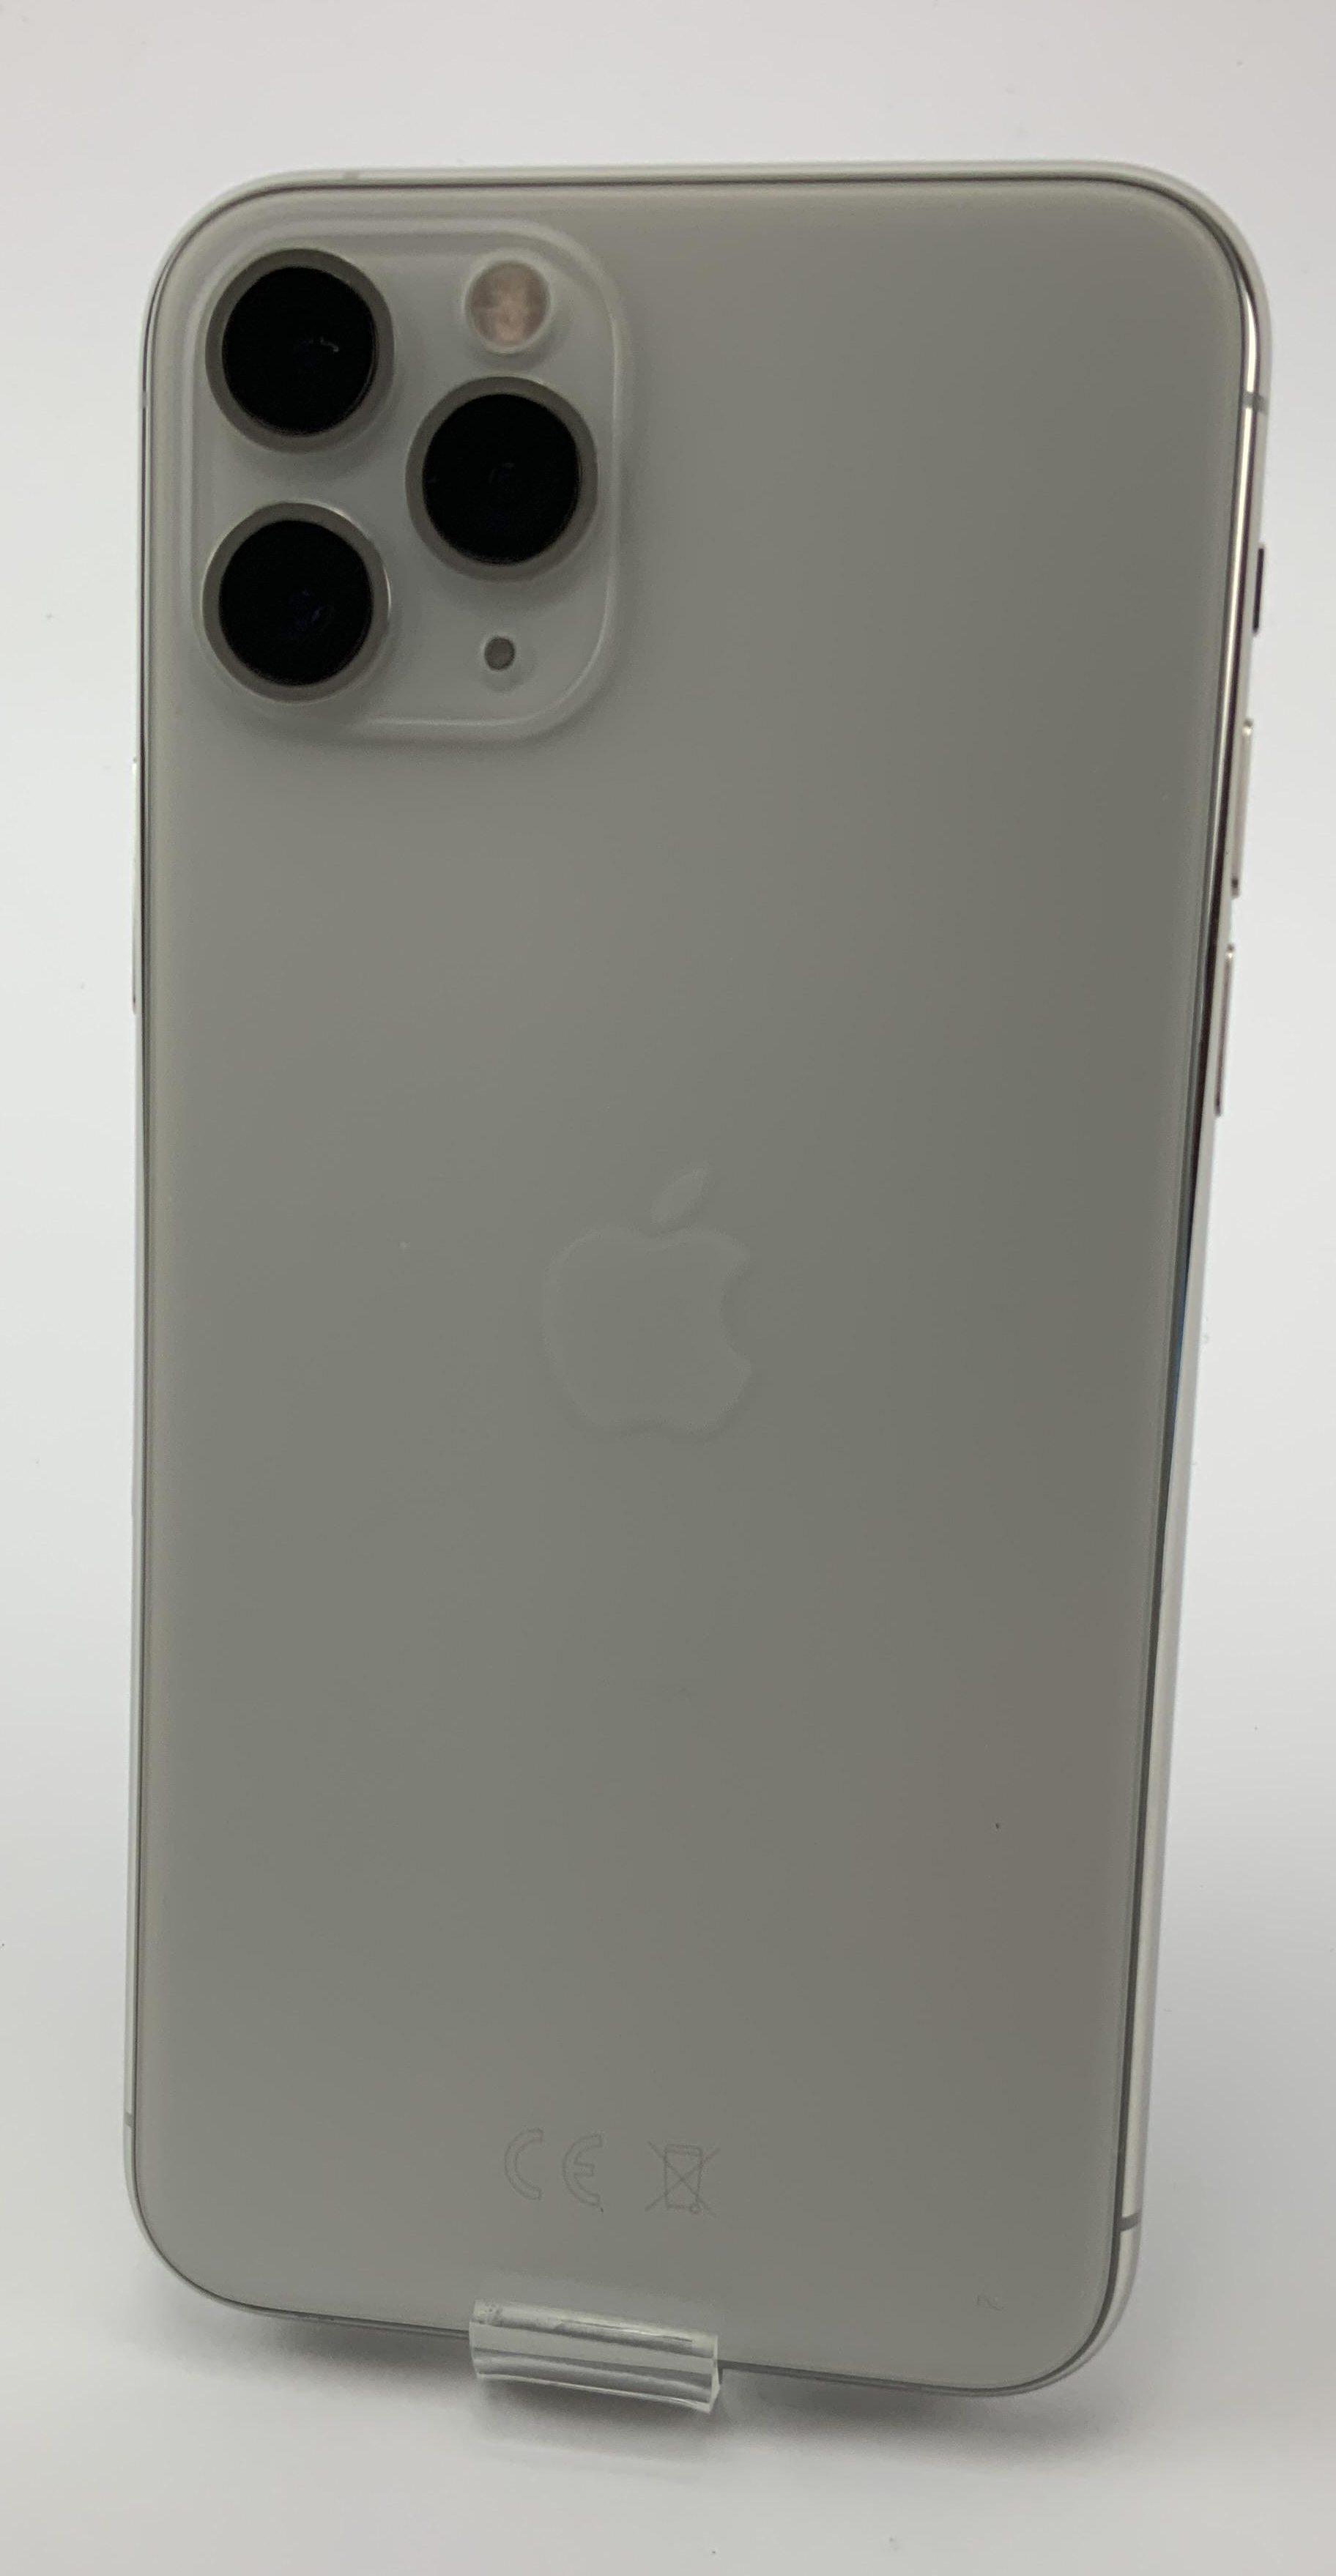 iPhone 11 Pro 64GB, 64GB, Silver, imagen 2